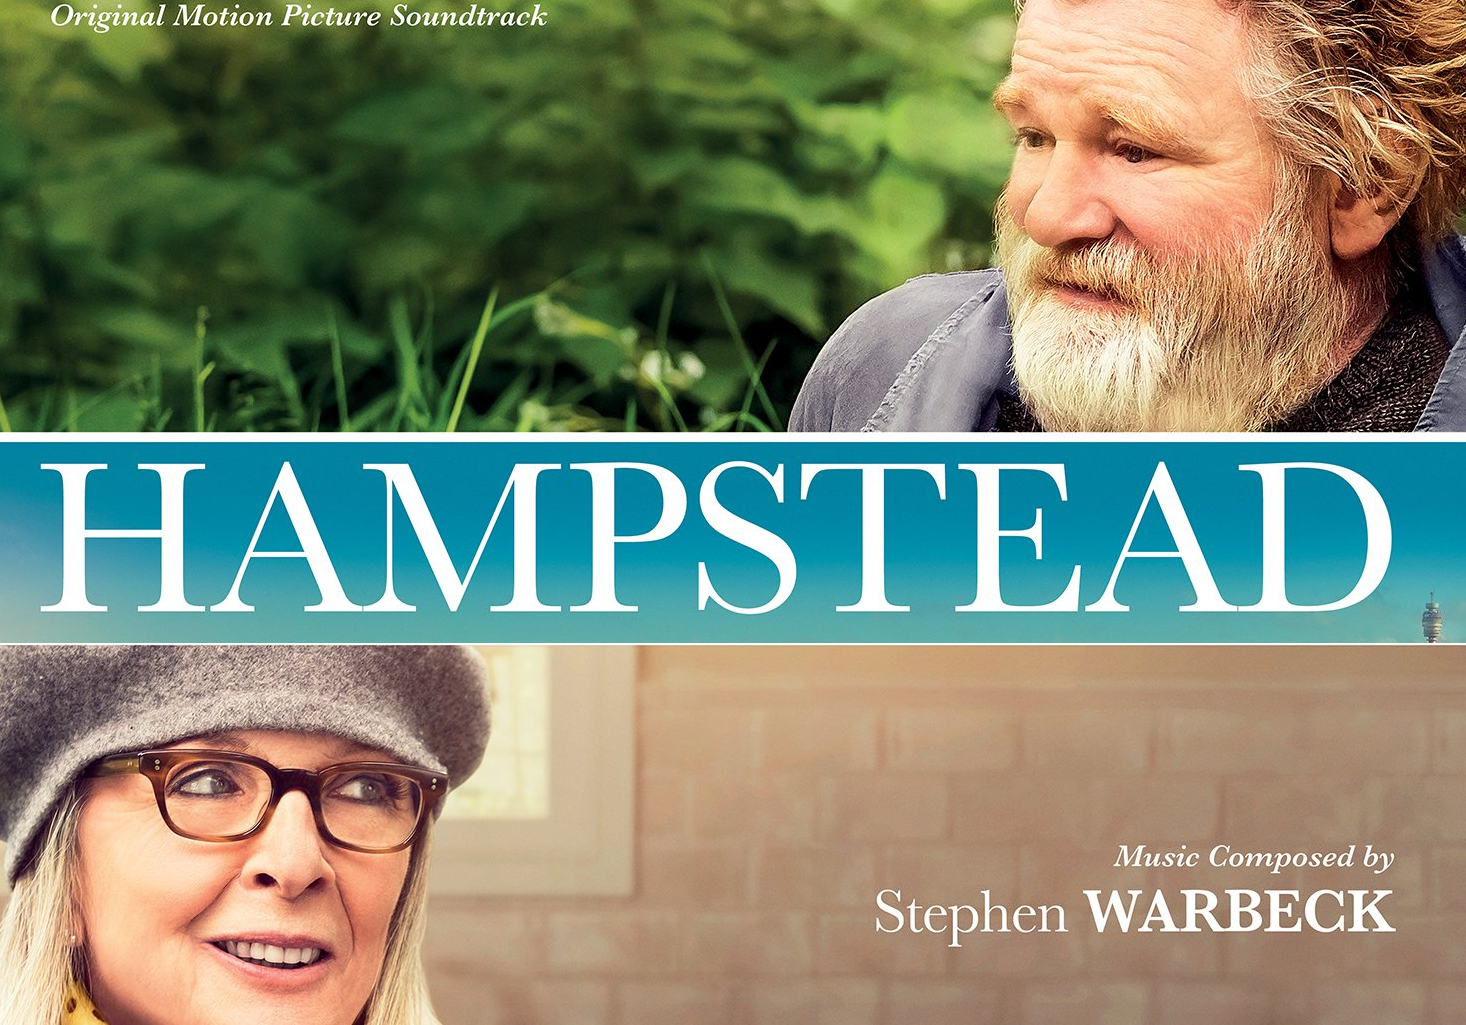 """Daftar Kumpulan Lagu Soundtrack Film Hampstead (2017)"""